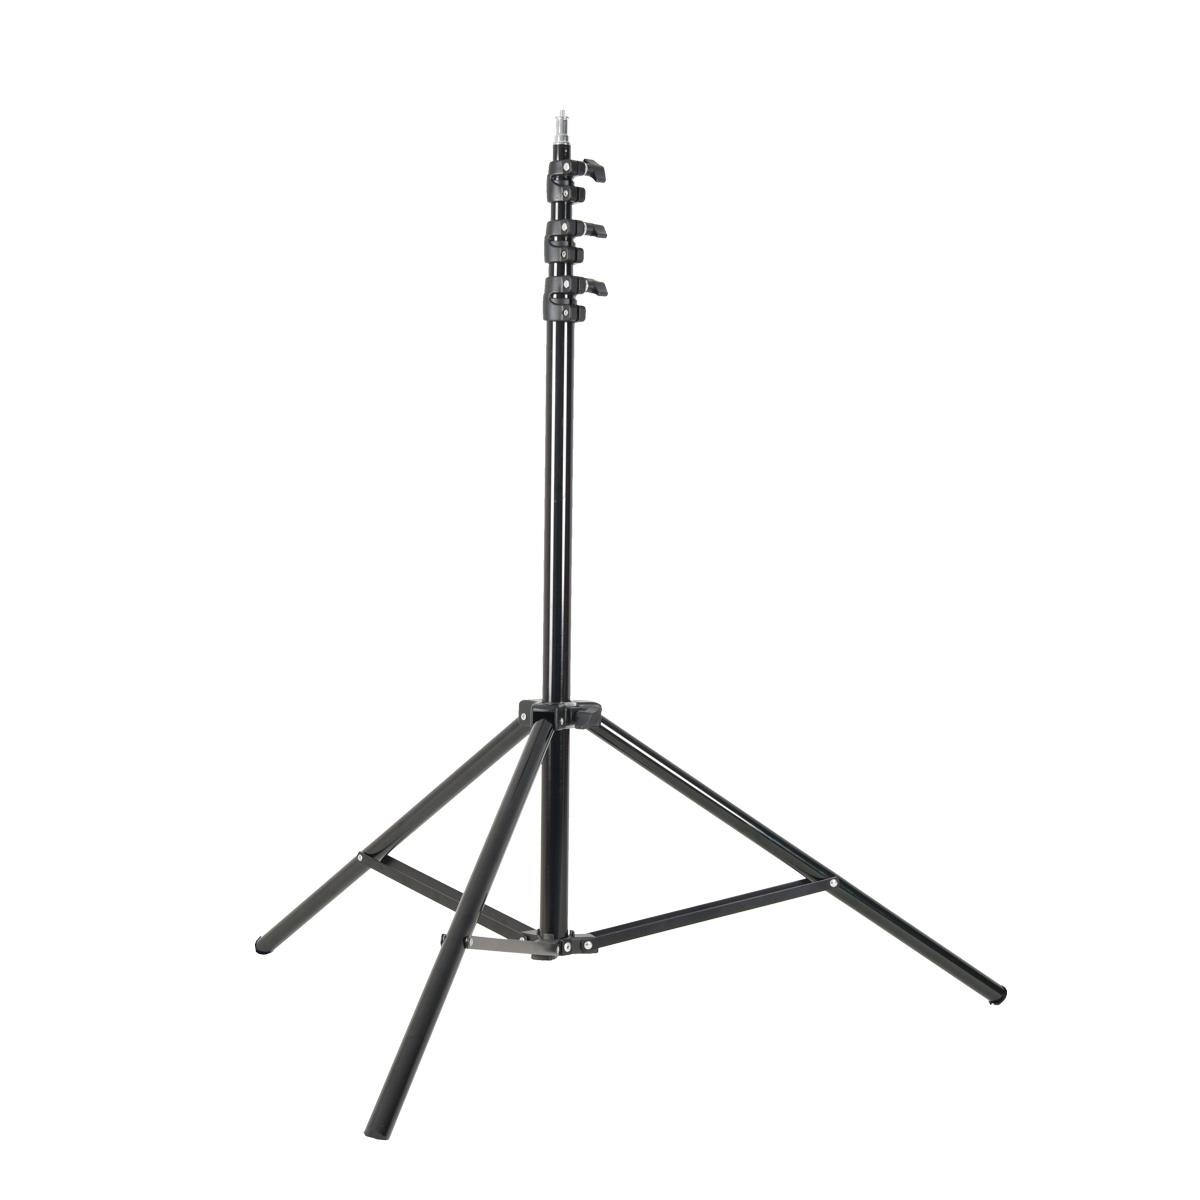 "Godox 380F Heavy-Duty Light Stand (12.5"")"